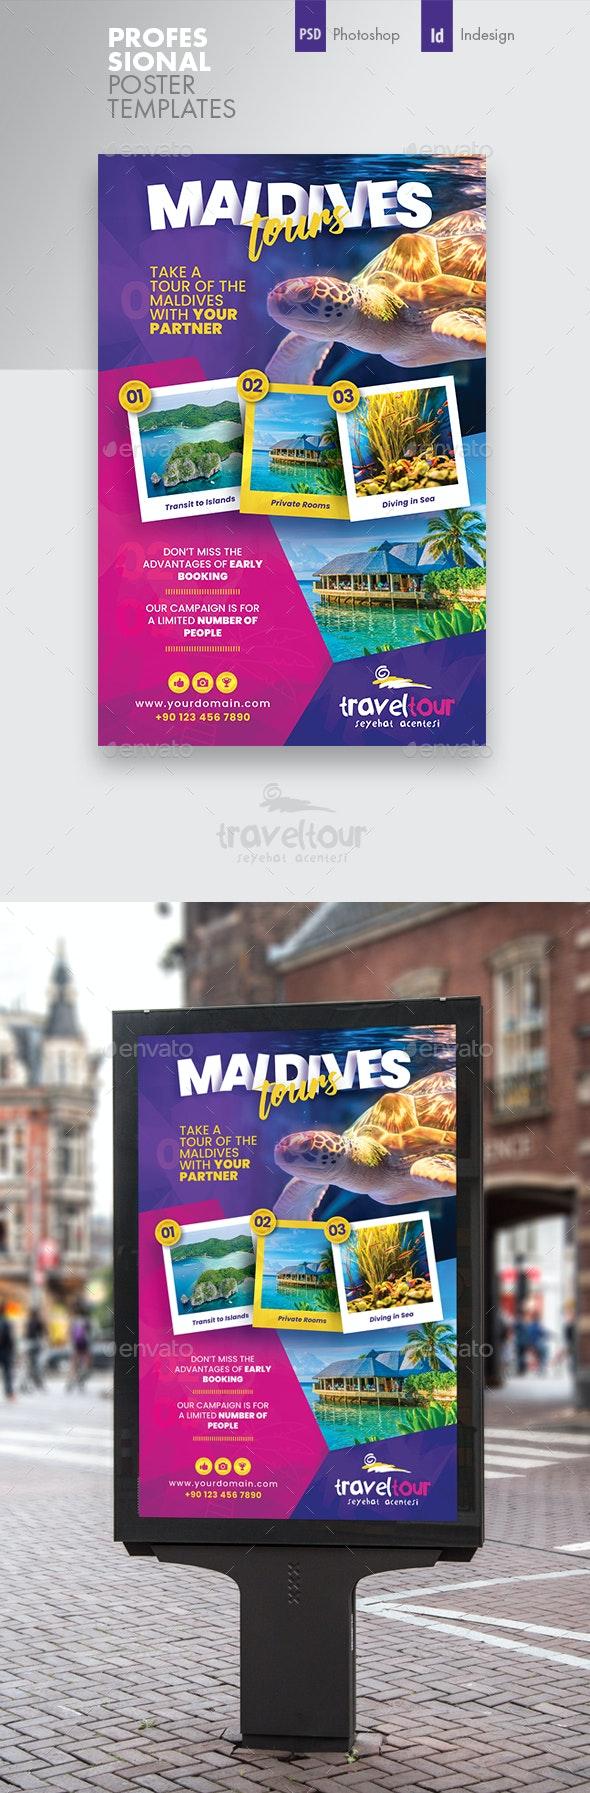 Travel Tours Poster Templates - Signage Print Templates